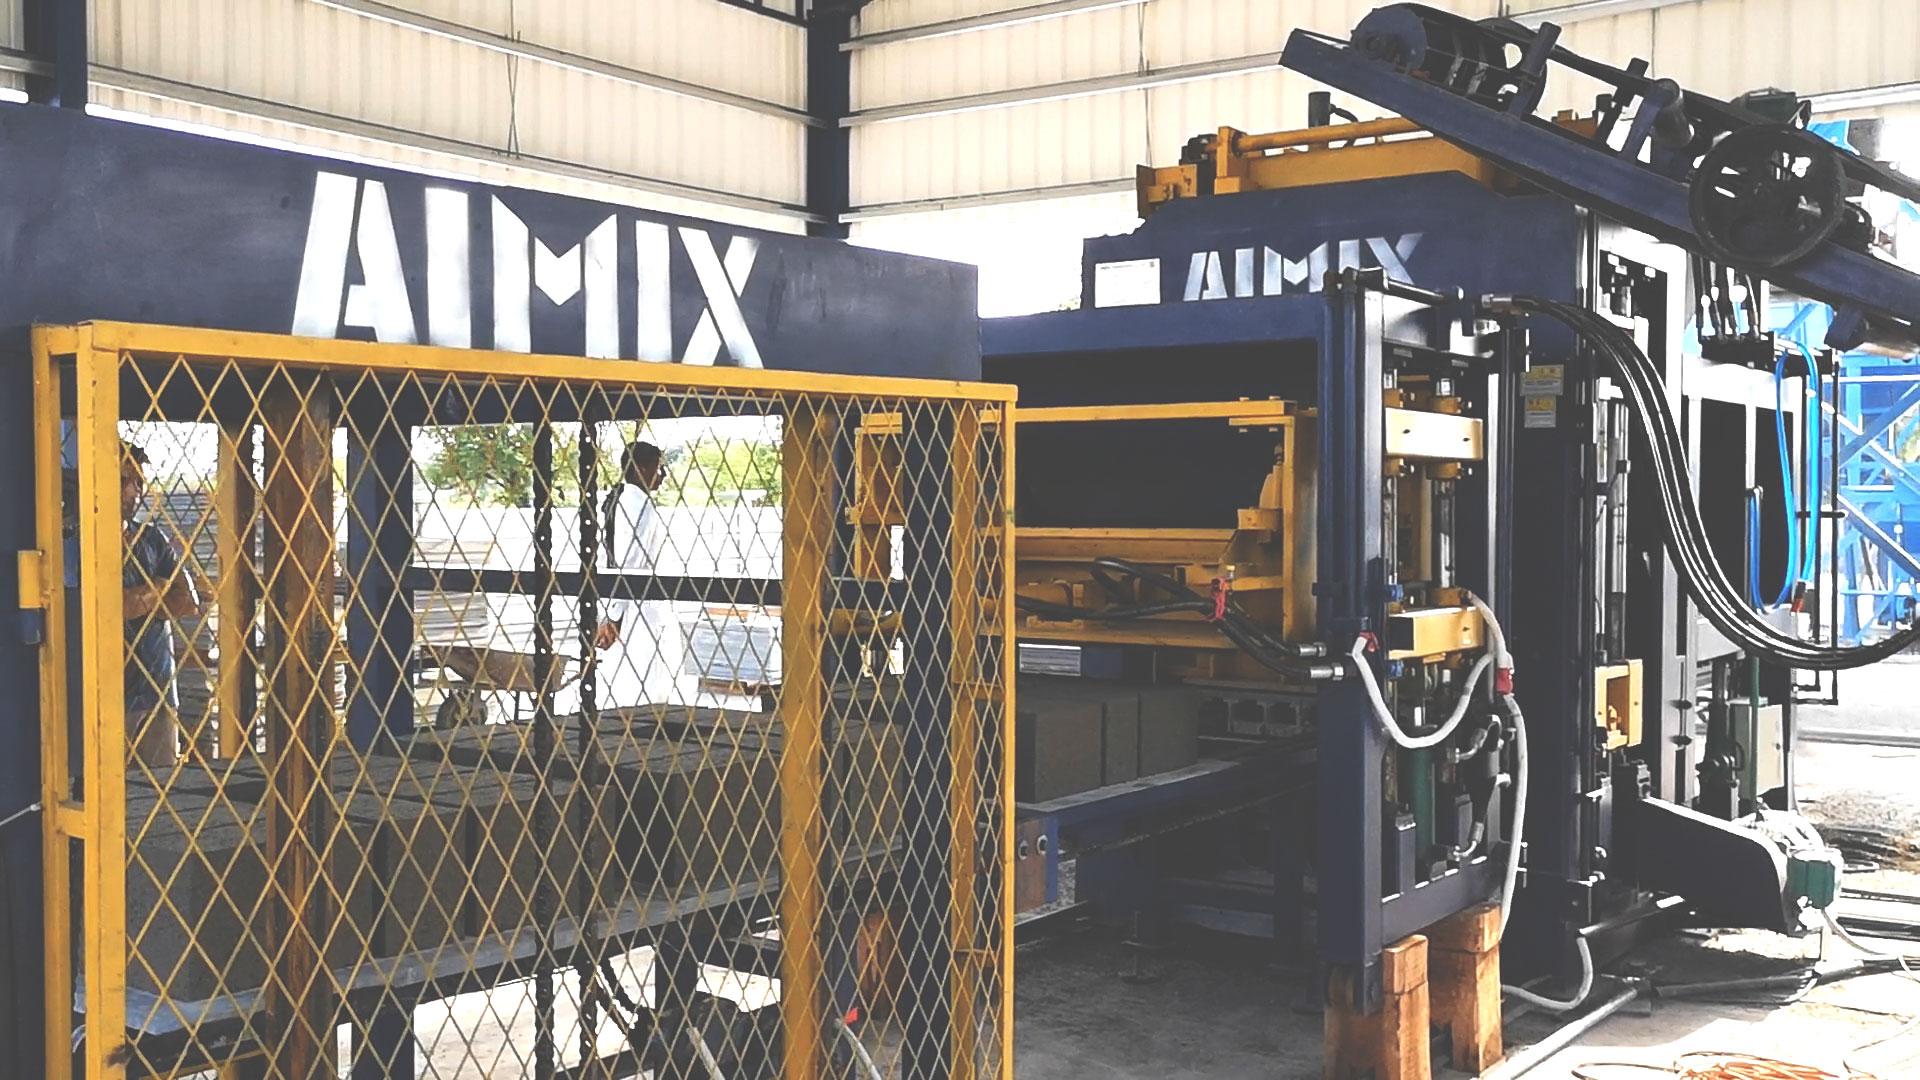 interlocking manufacturing machine